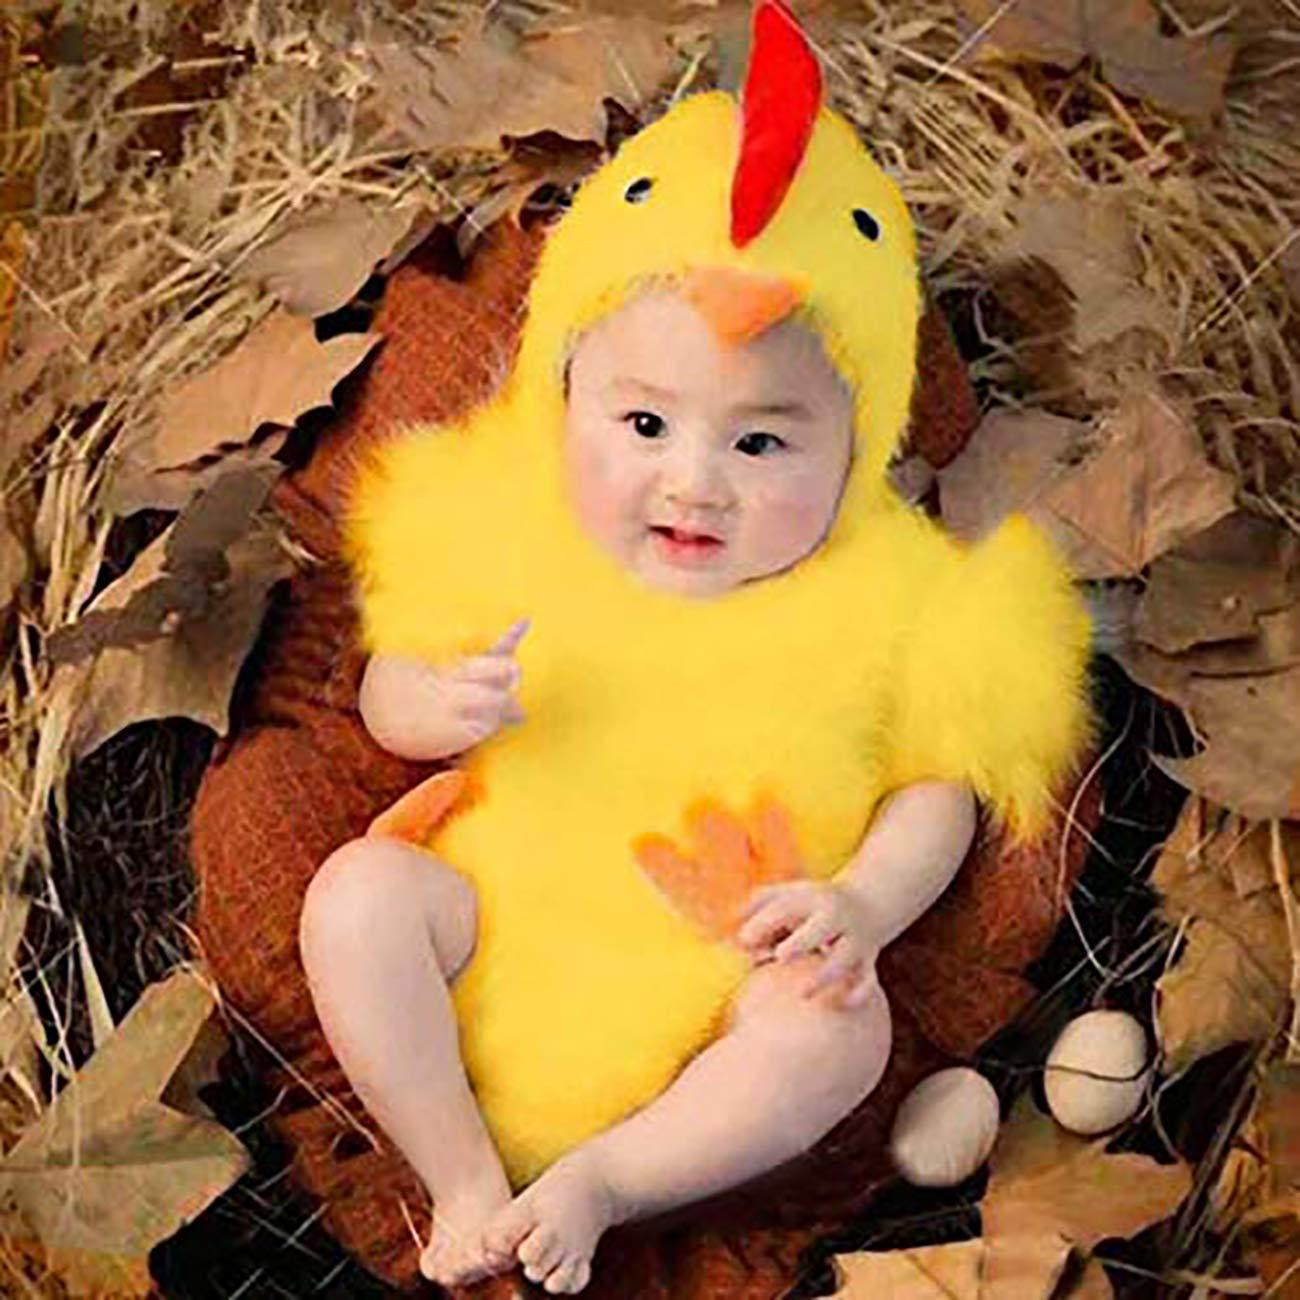 Feynman Newborn Baby Photography Costume Set